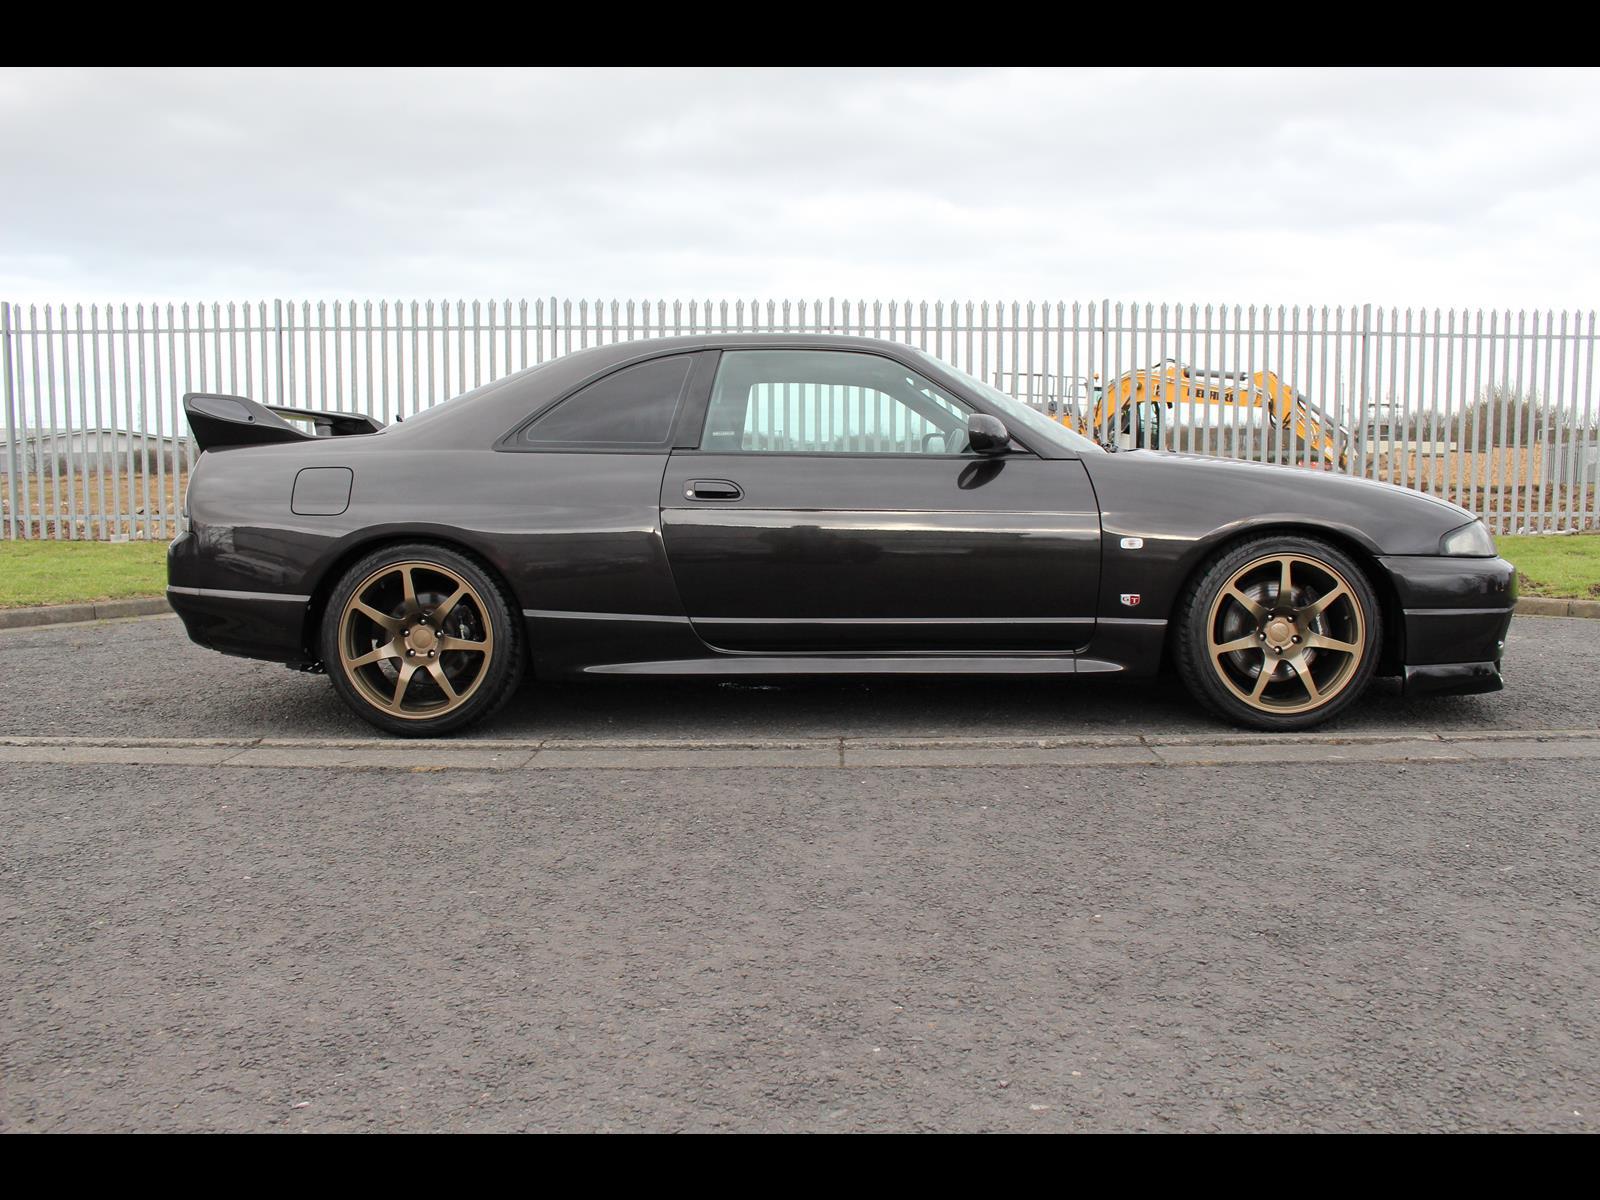 1997 Nissan Skyline R33 Gtr Series 3 Jm Imports